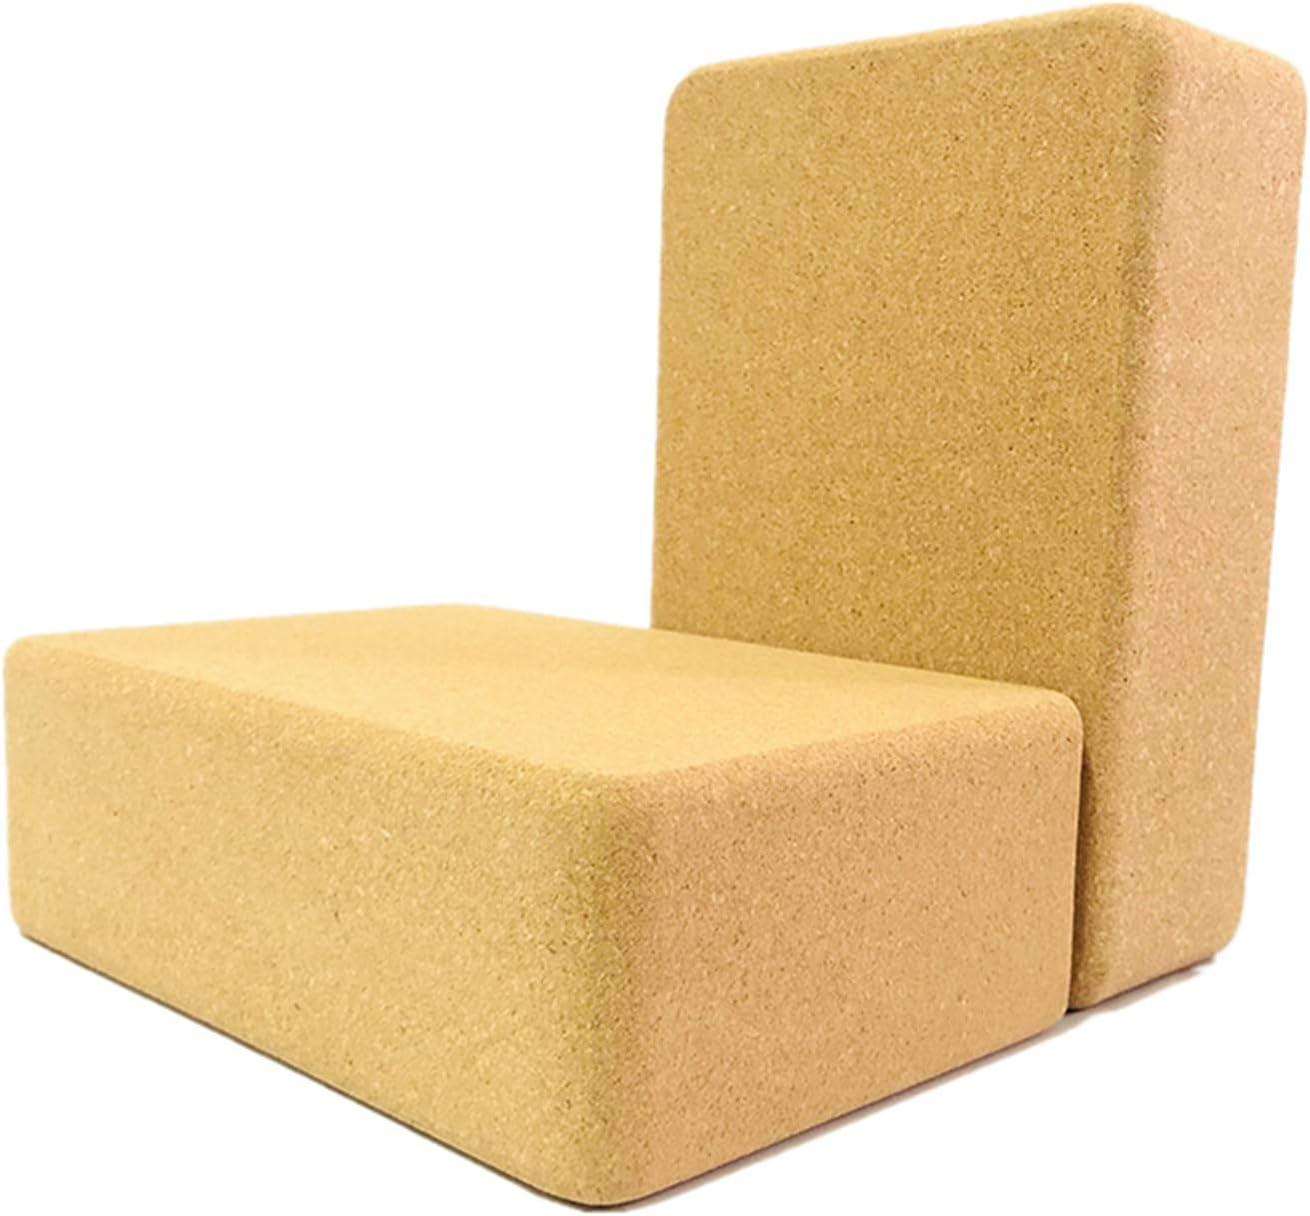 Miami Mall LEFUYAN Yoga Blocks High New popularity Density Pure Foam St Brick Improve Cork